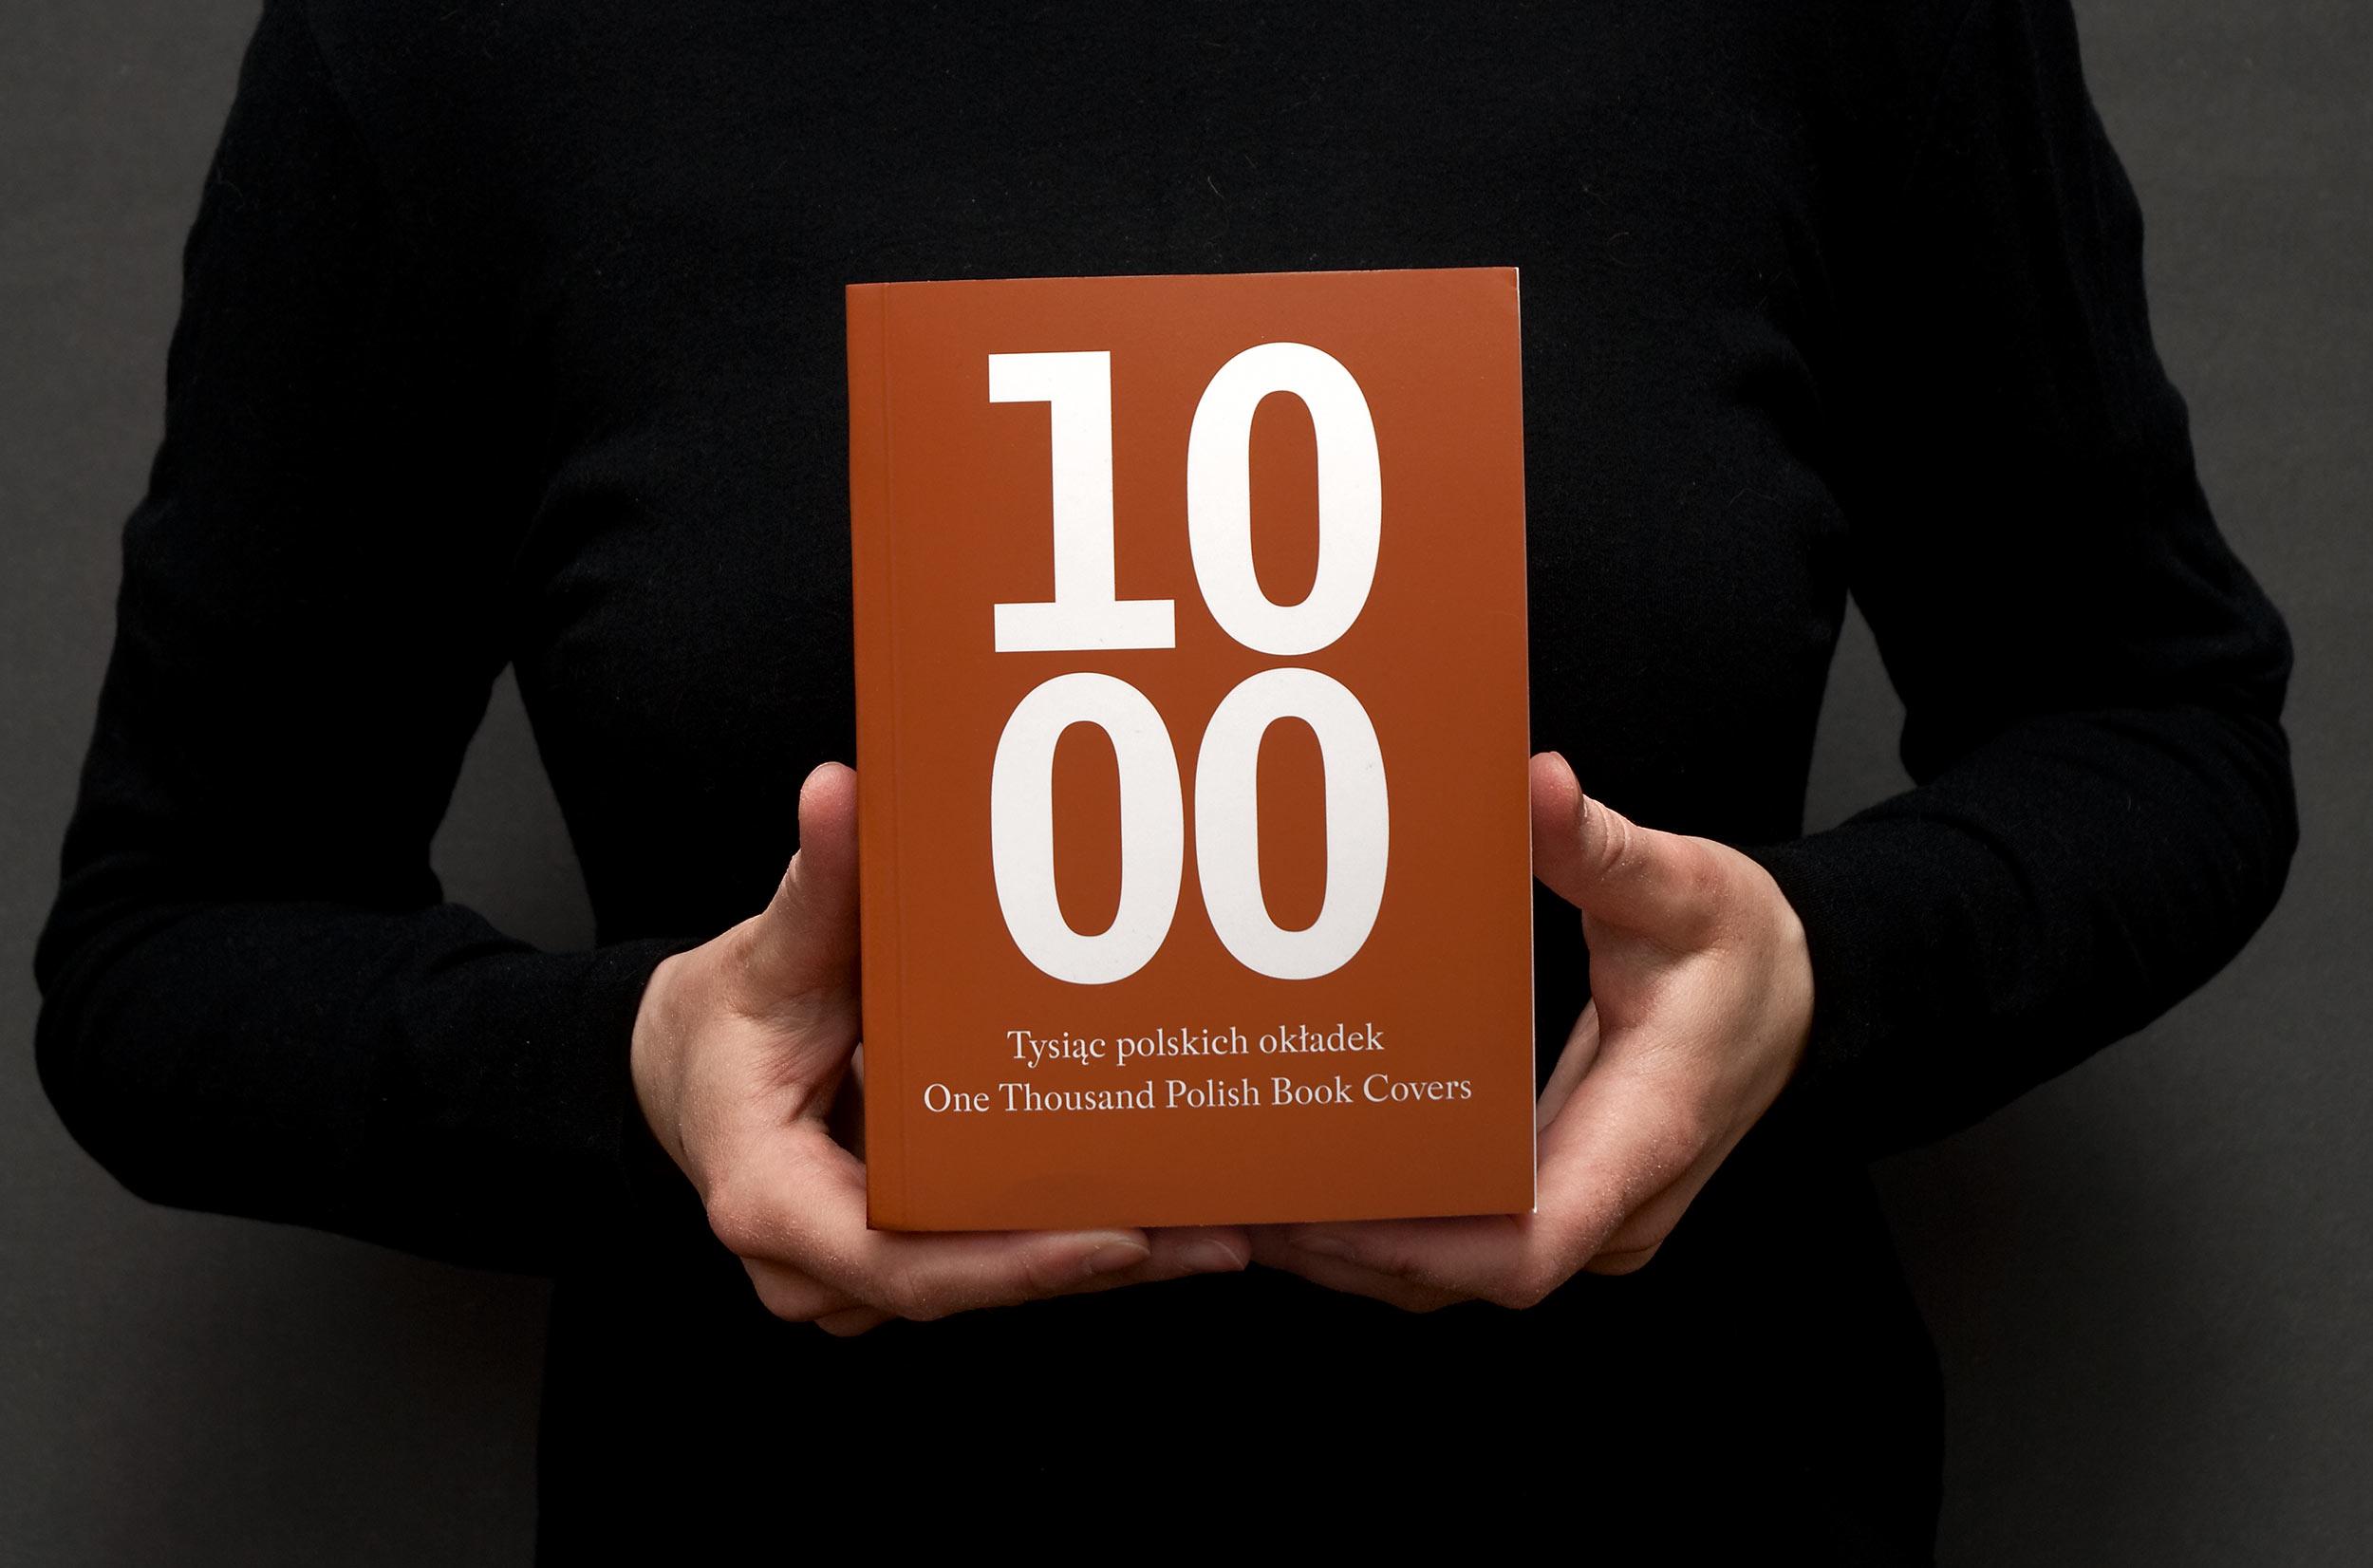 1000-polskich-okladek-01.jpg